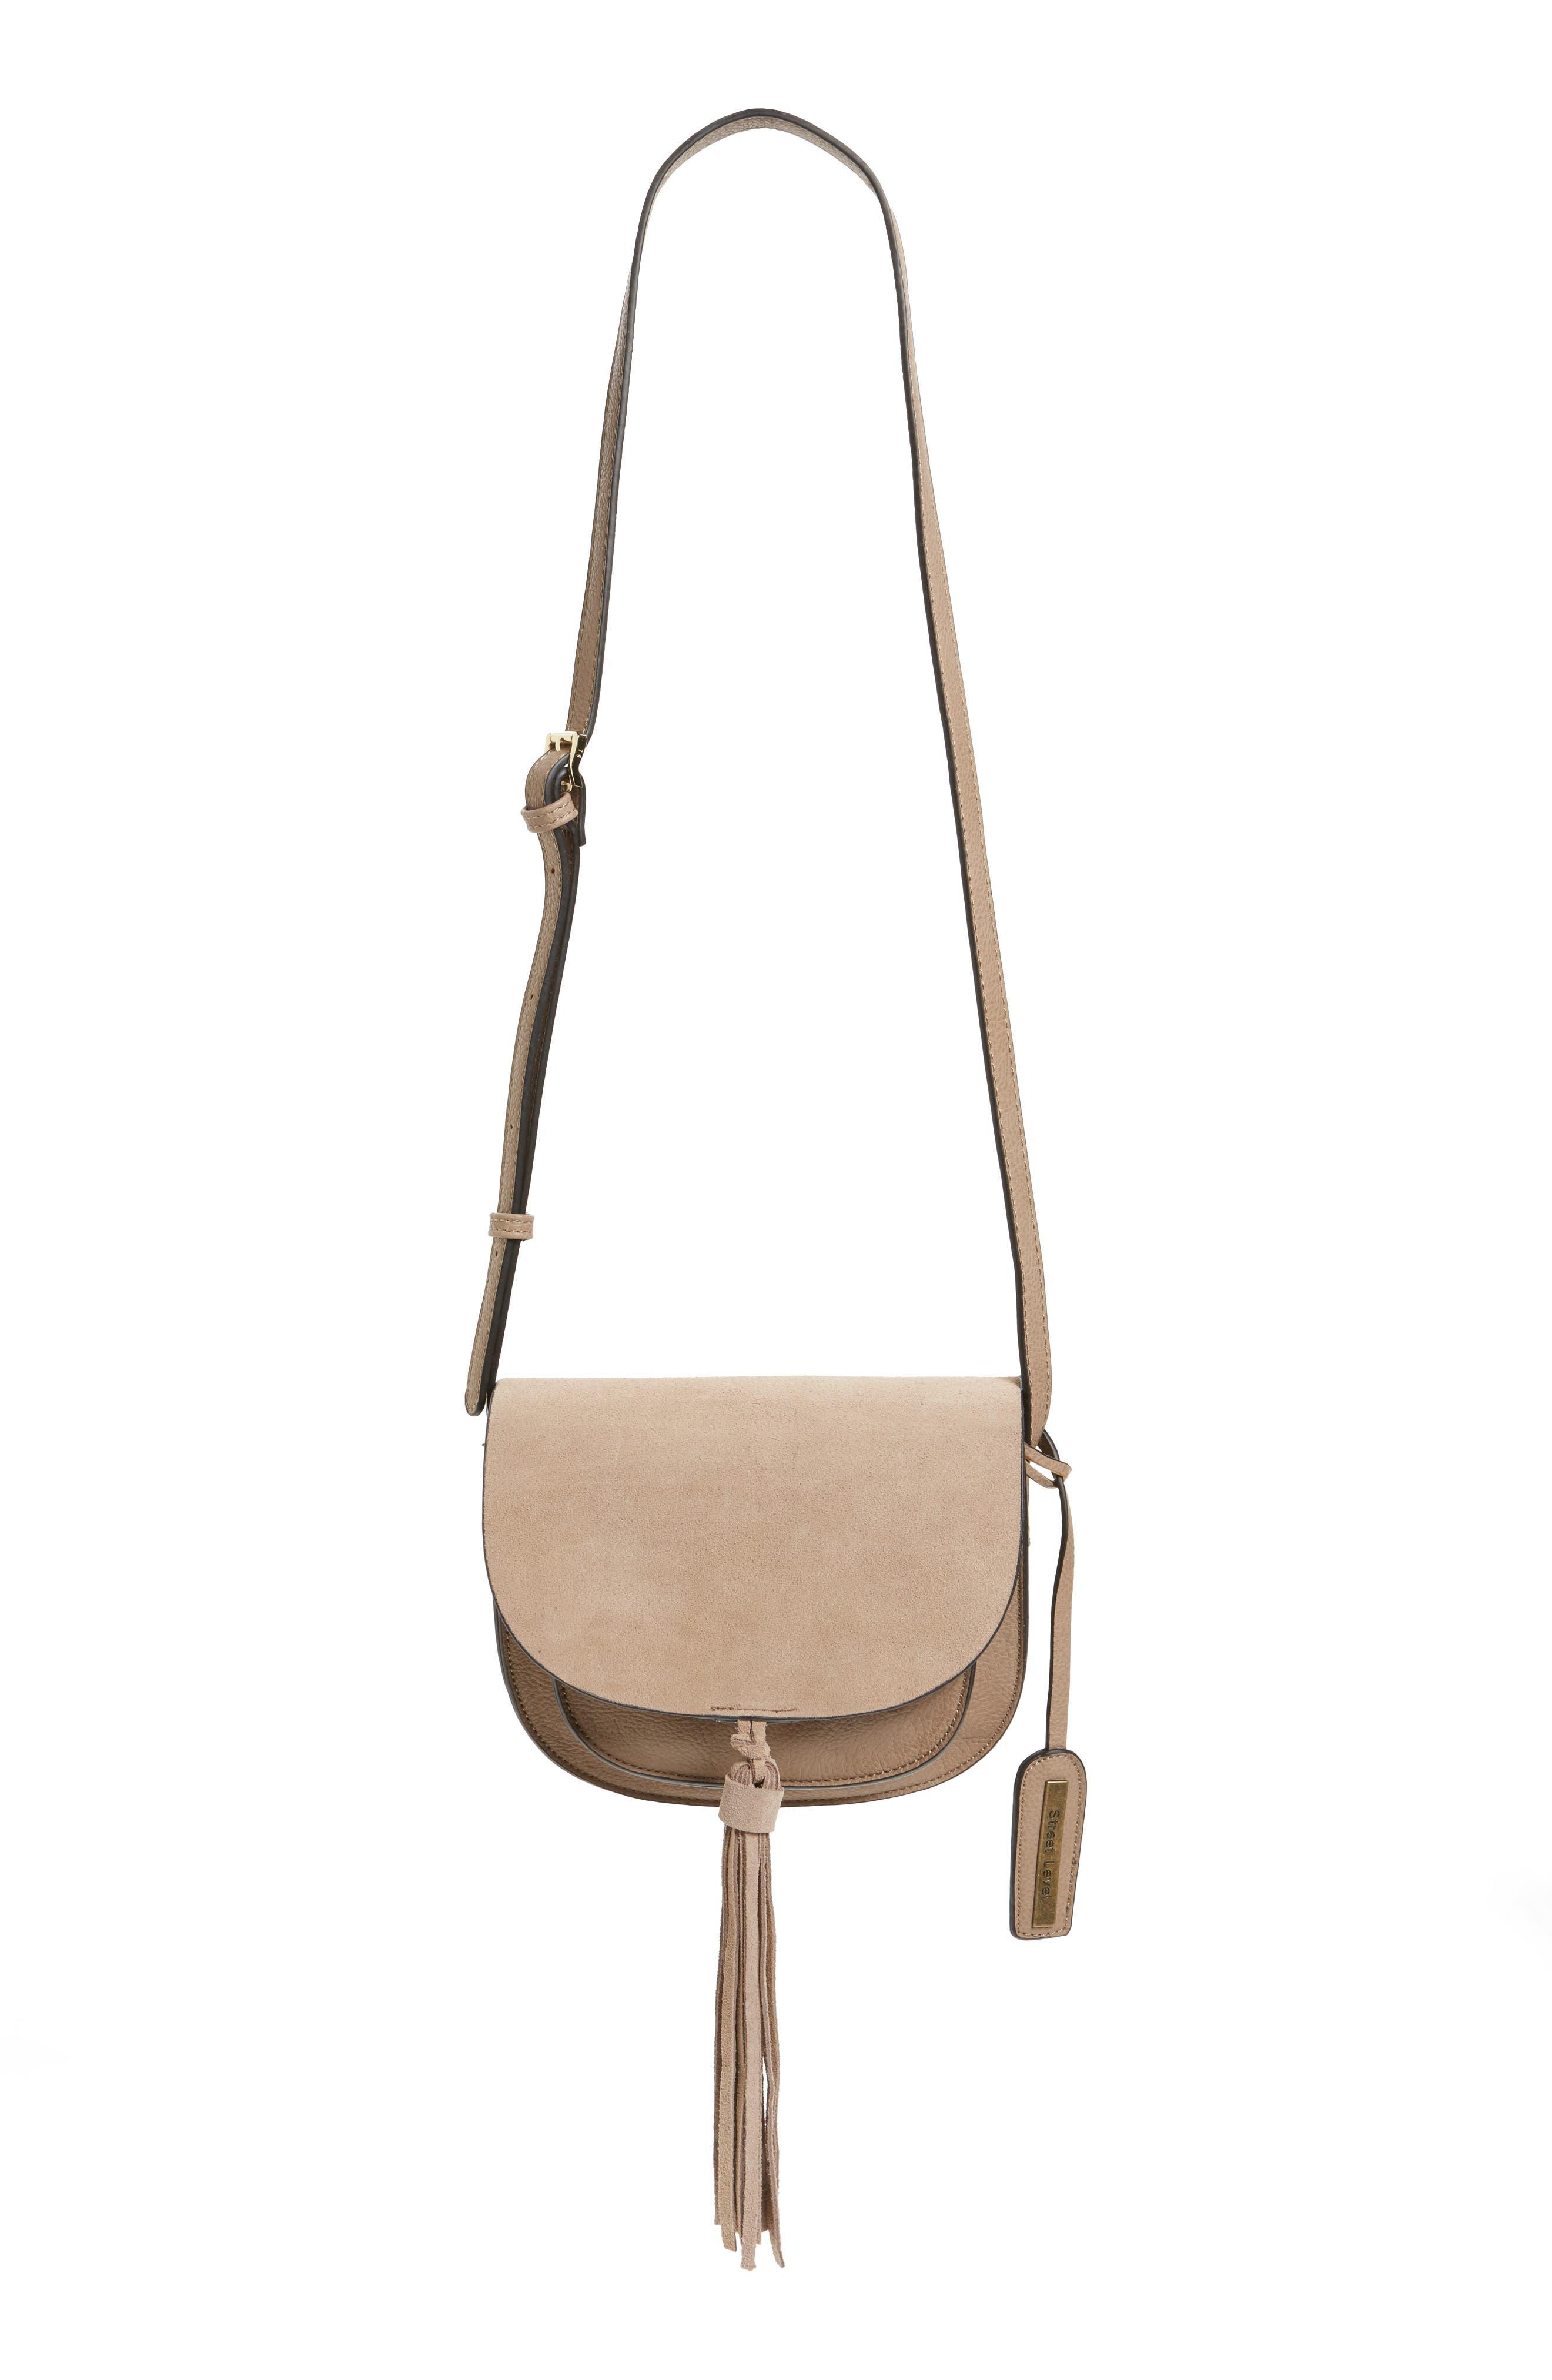 Tassel Faux Leather Crossbody Bag,                             Main thumbnail 1, color,                             250